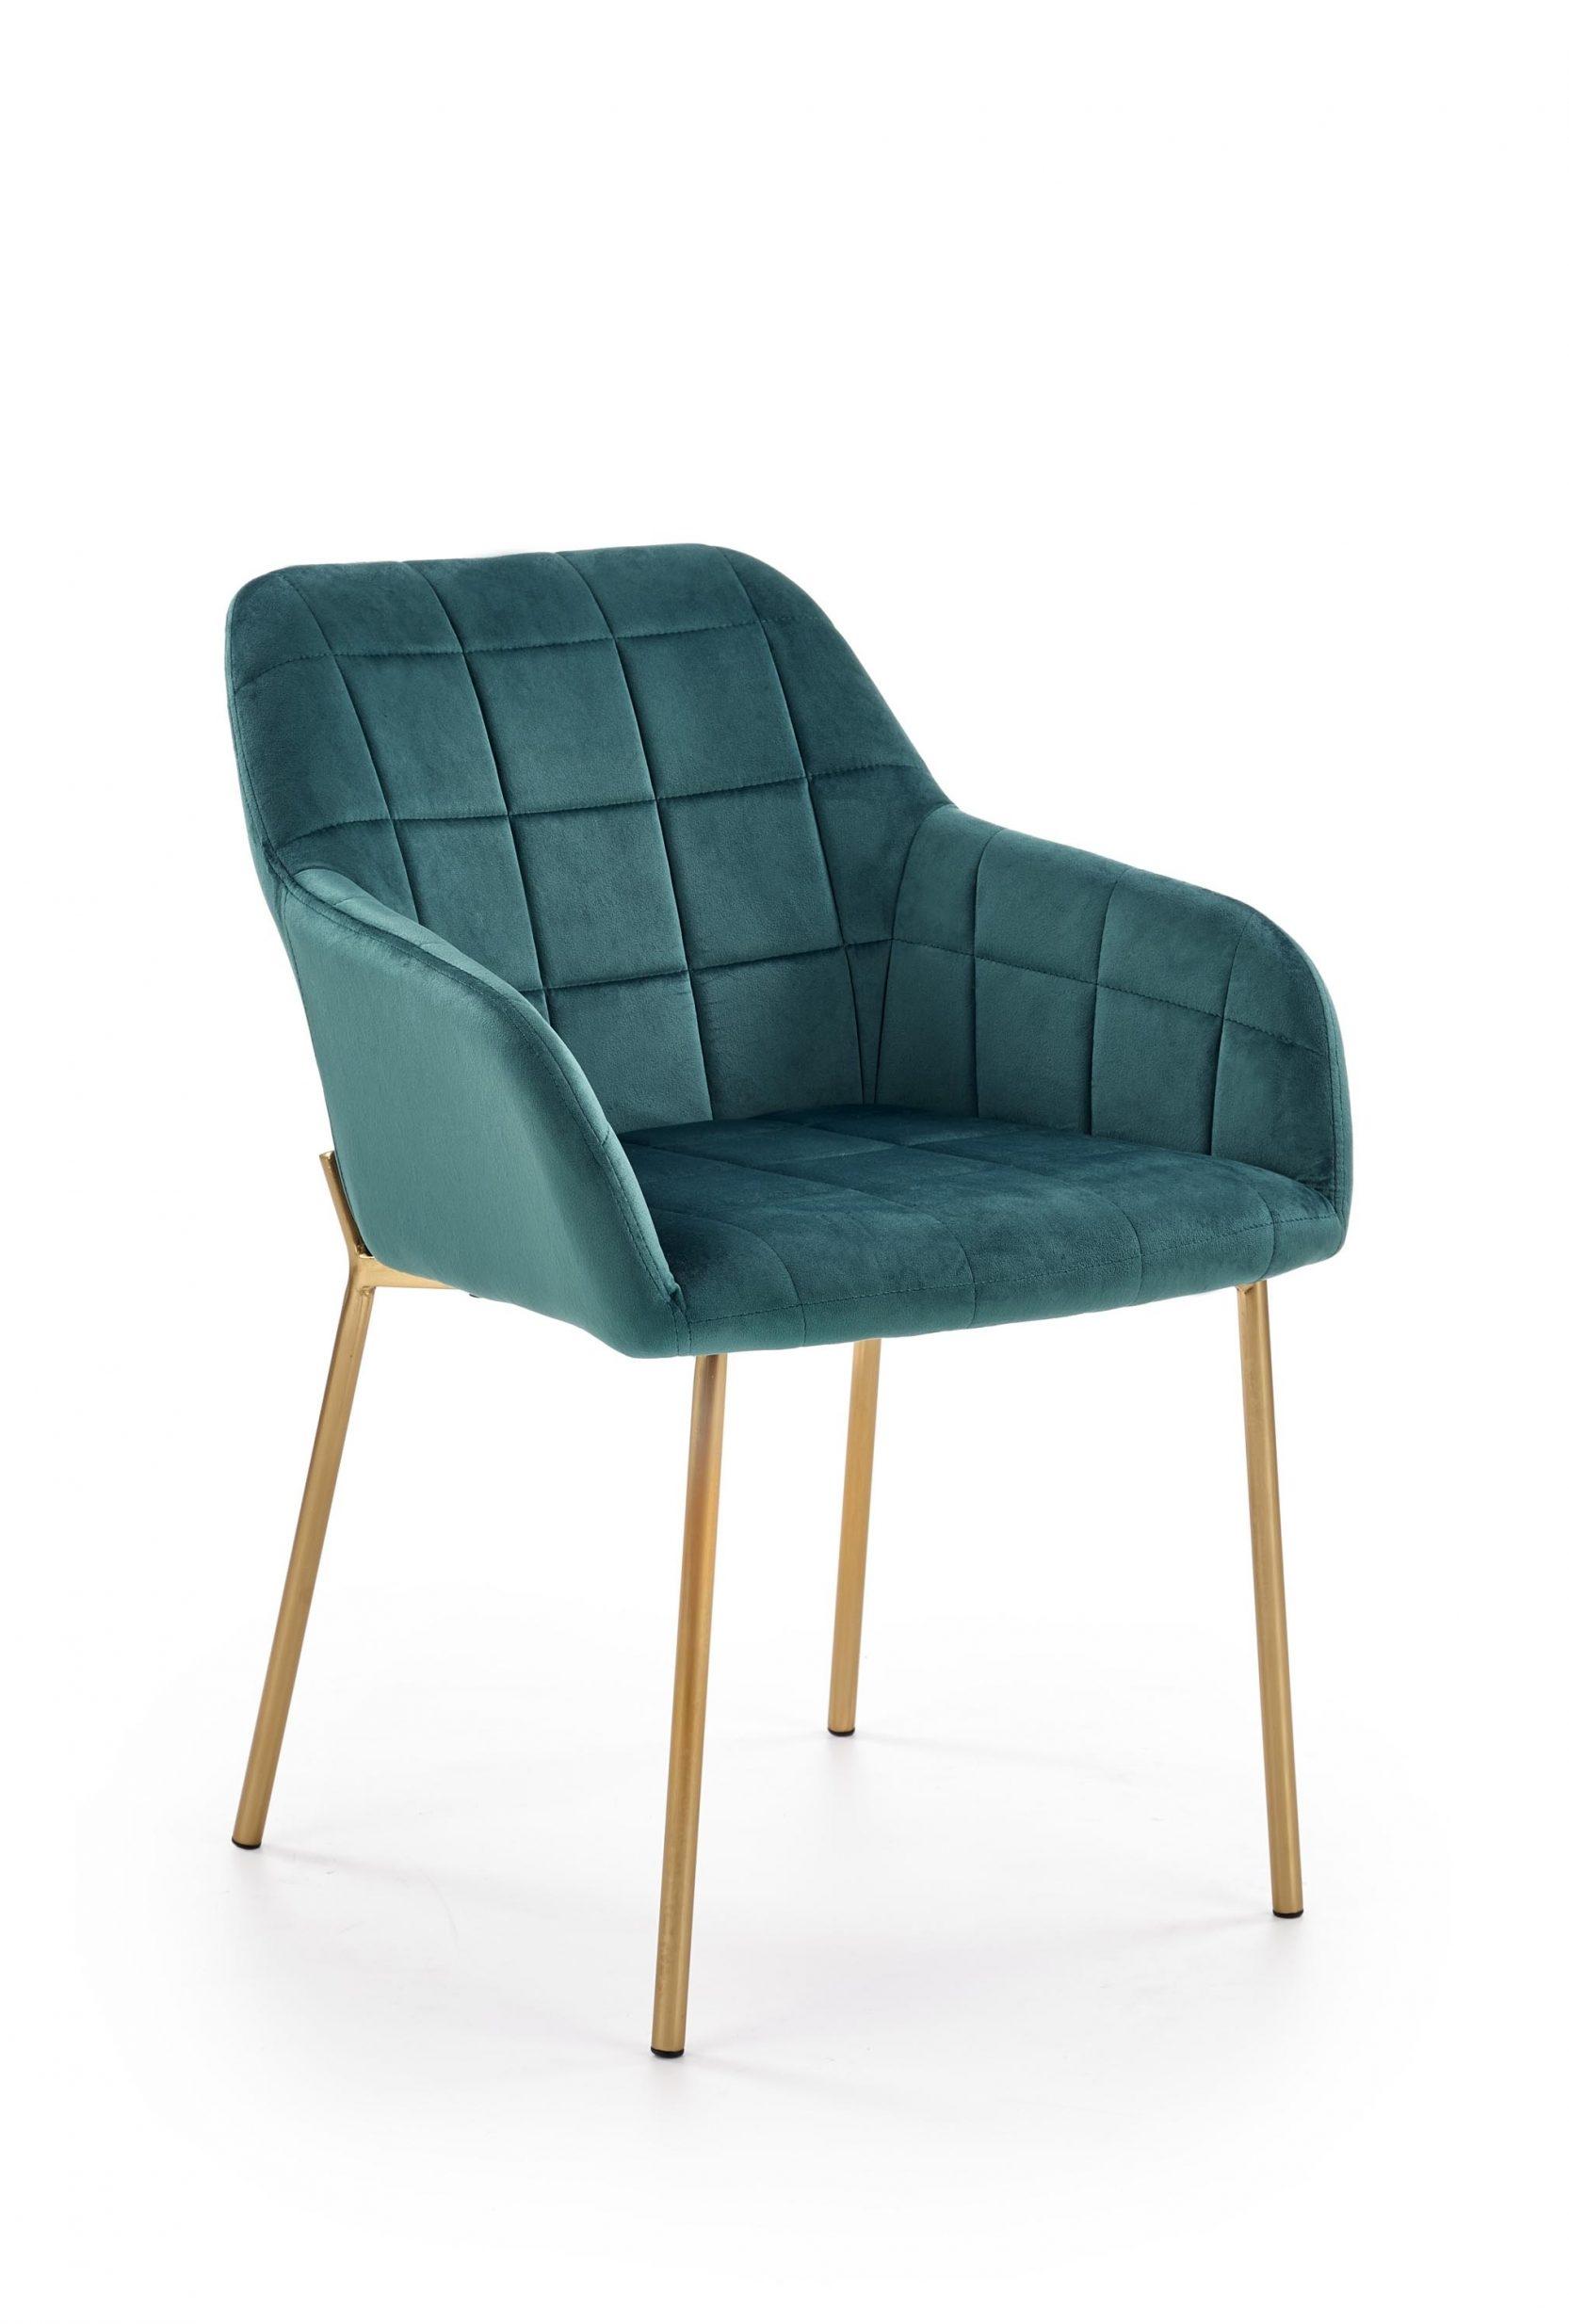 Scaun tapitat cu stofa cu picioare metalice K306 Verde inchis / Auriu l58xA57xH80 cm